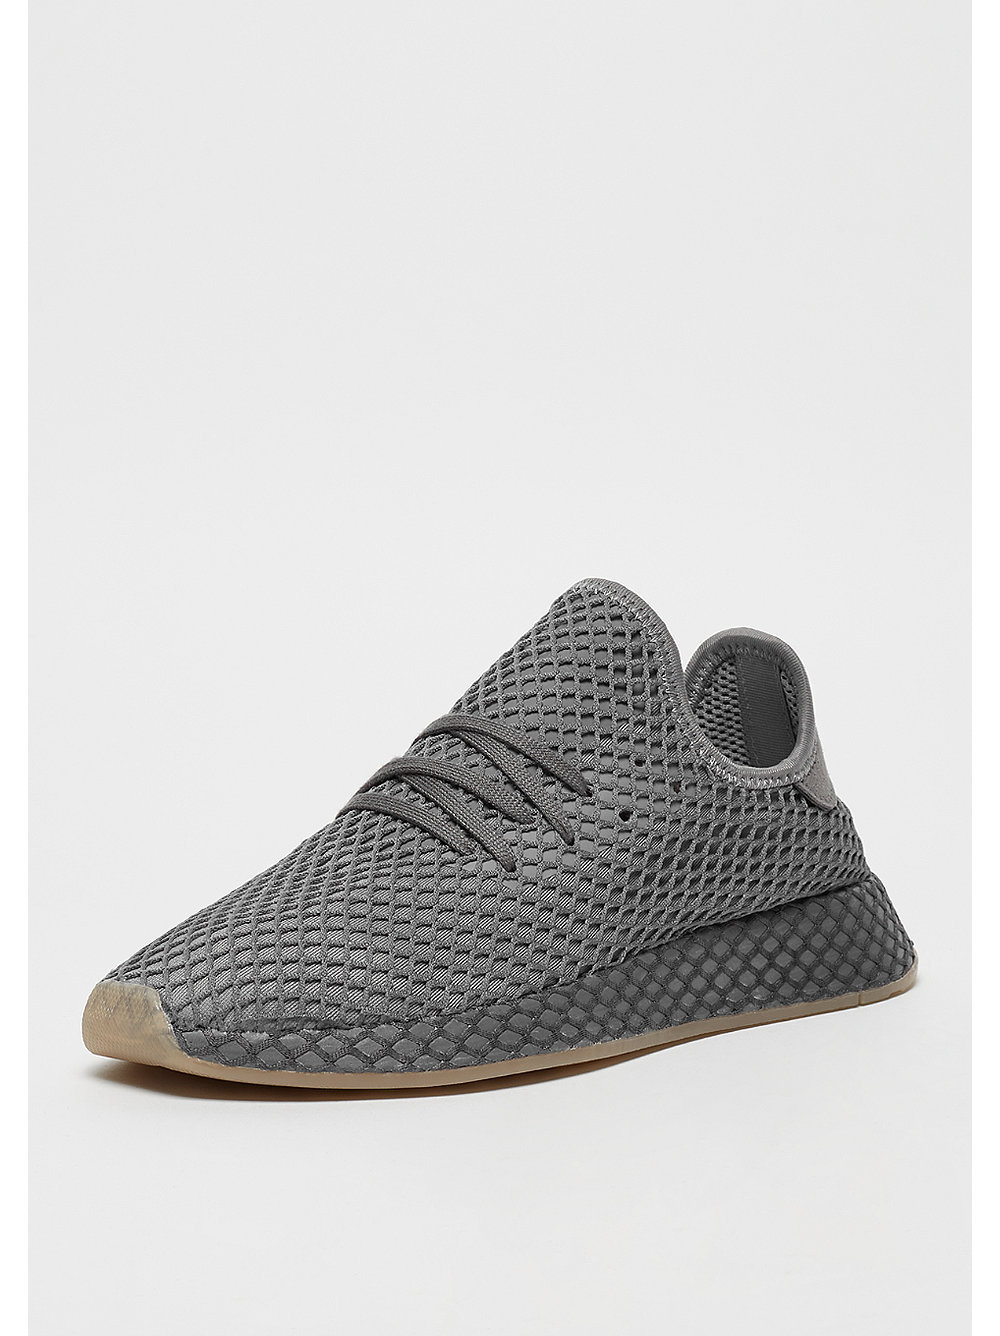 wholesale dealer a5c9b 2aa4a Zapatillas adidas Originals Deerupt Runner en SNIPES